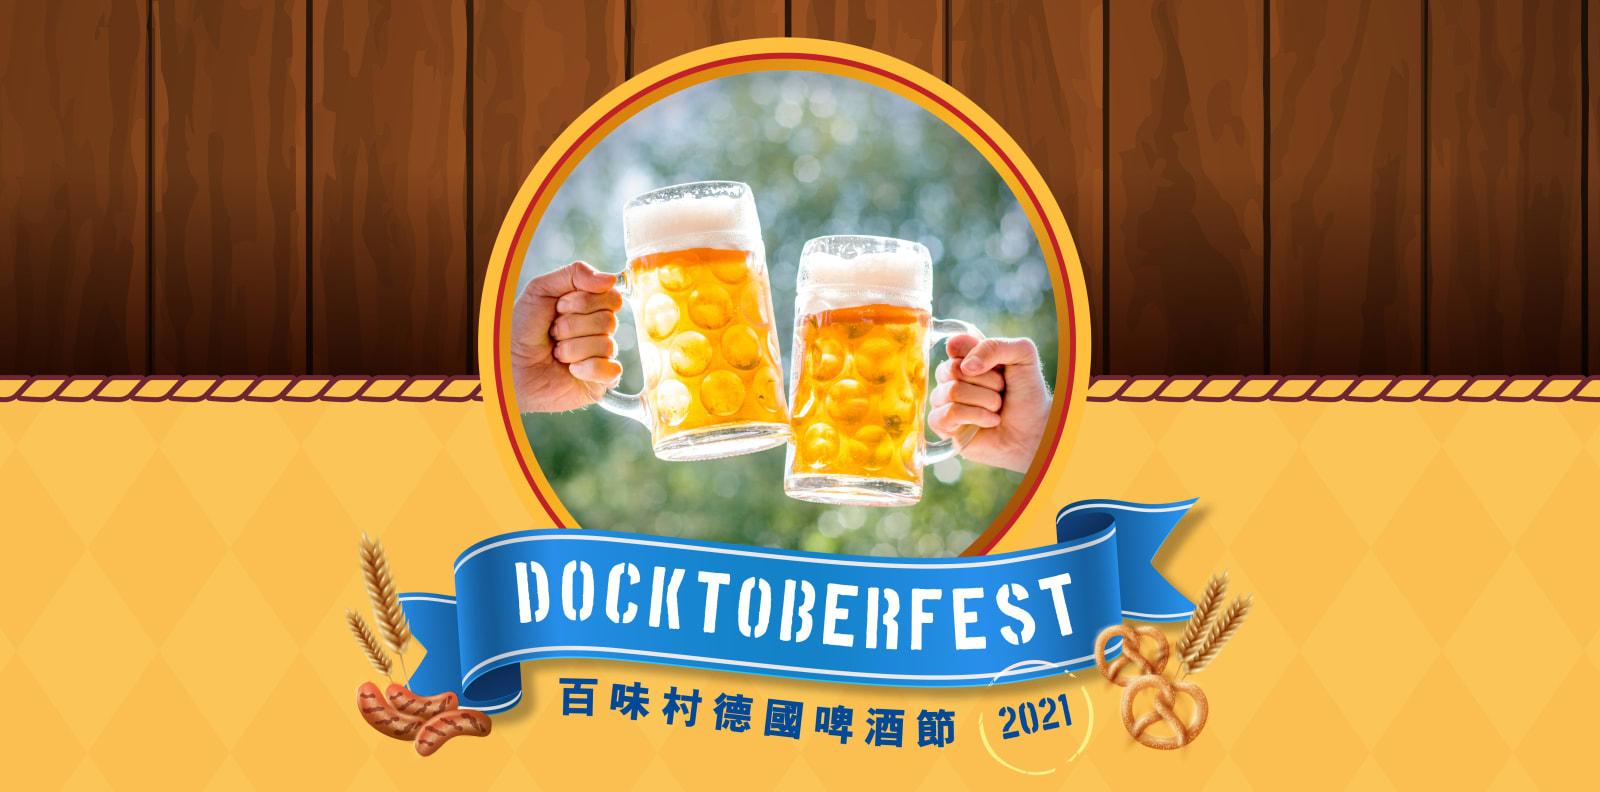 Docktoberfest at Dockyard 2021